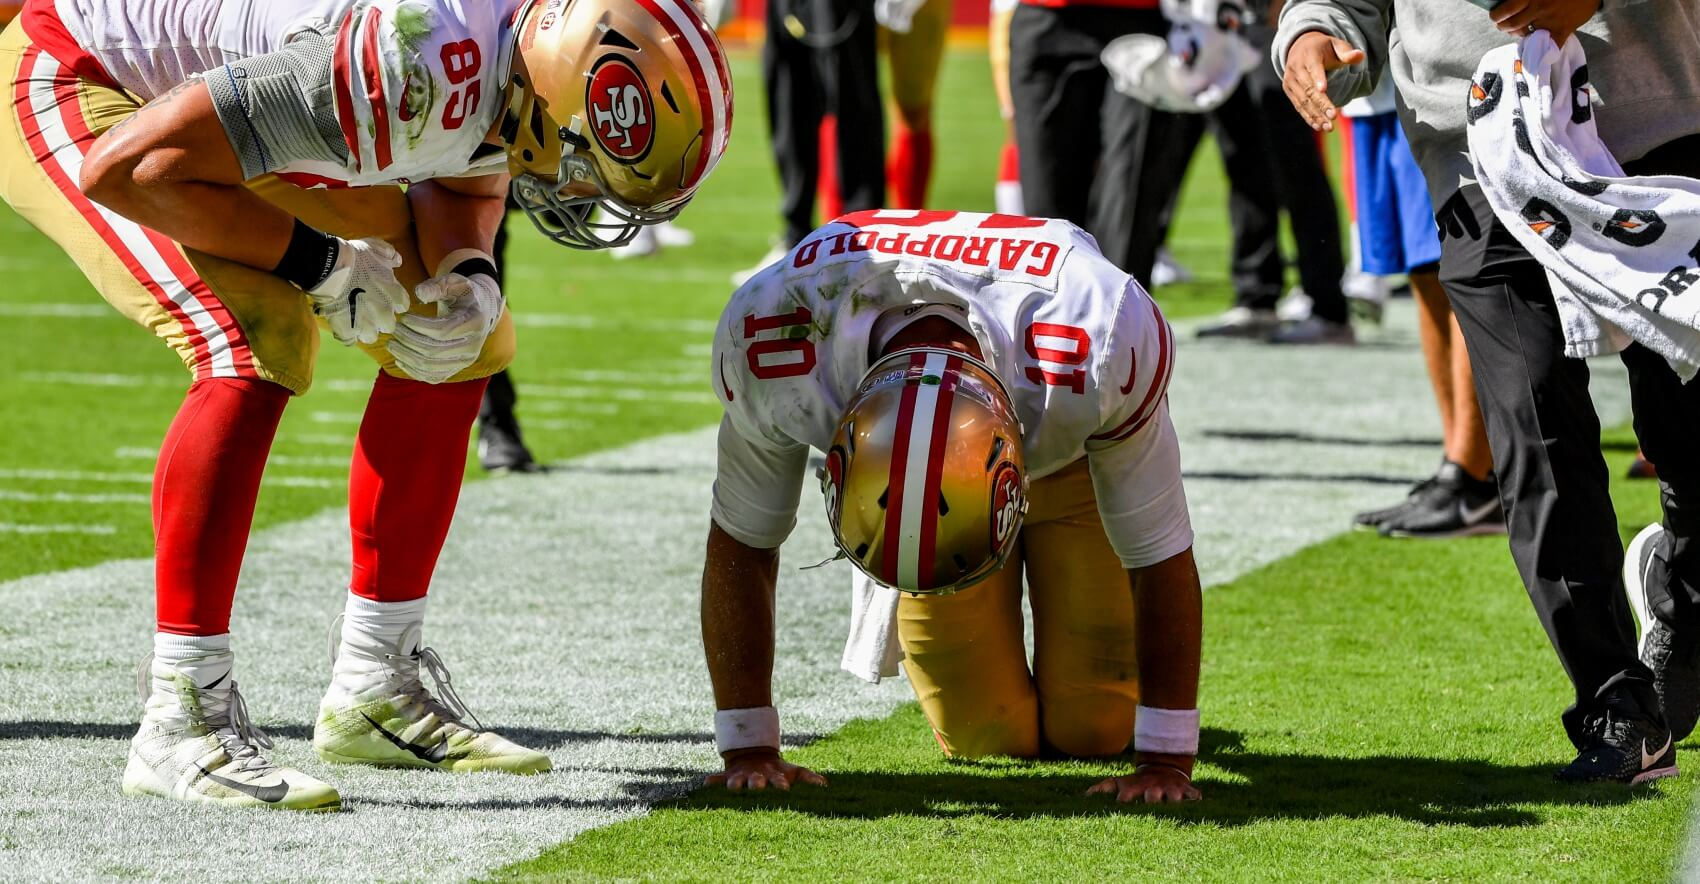 Fantasy Football: NFL Week 3 Injury Recap